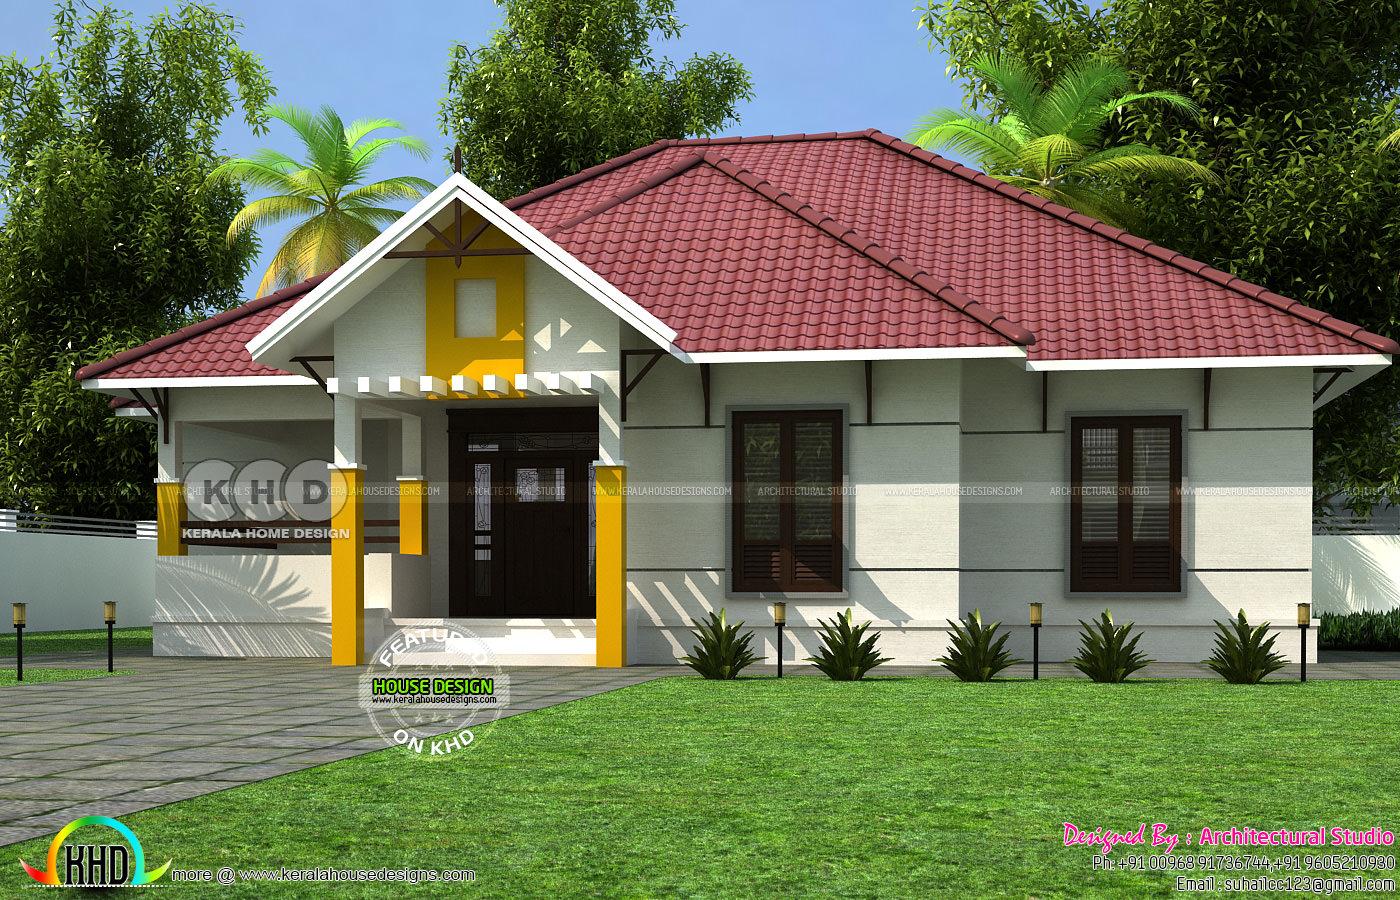 1400 Square Feet 3 Bedroom Sloped Roof Home Kerala Home